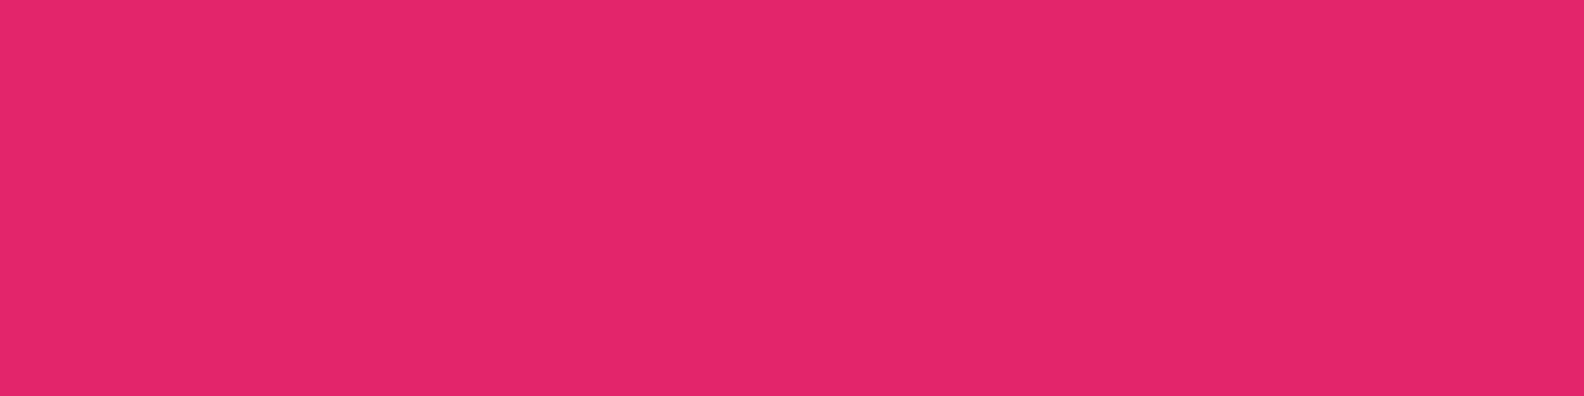 1584x396 Razzmatazz Solid Color Background